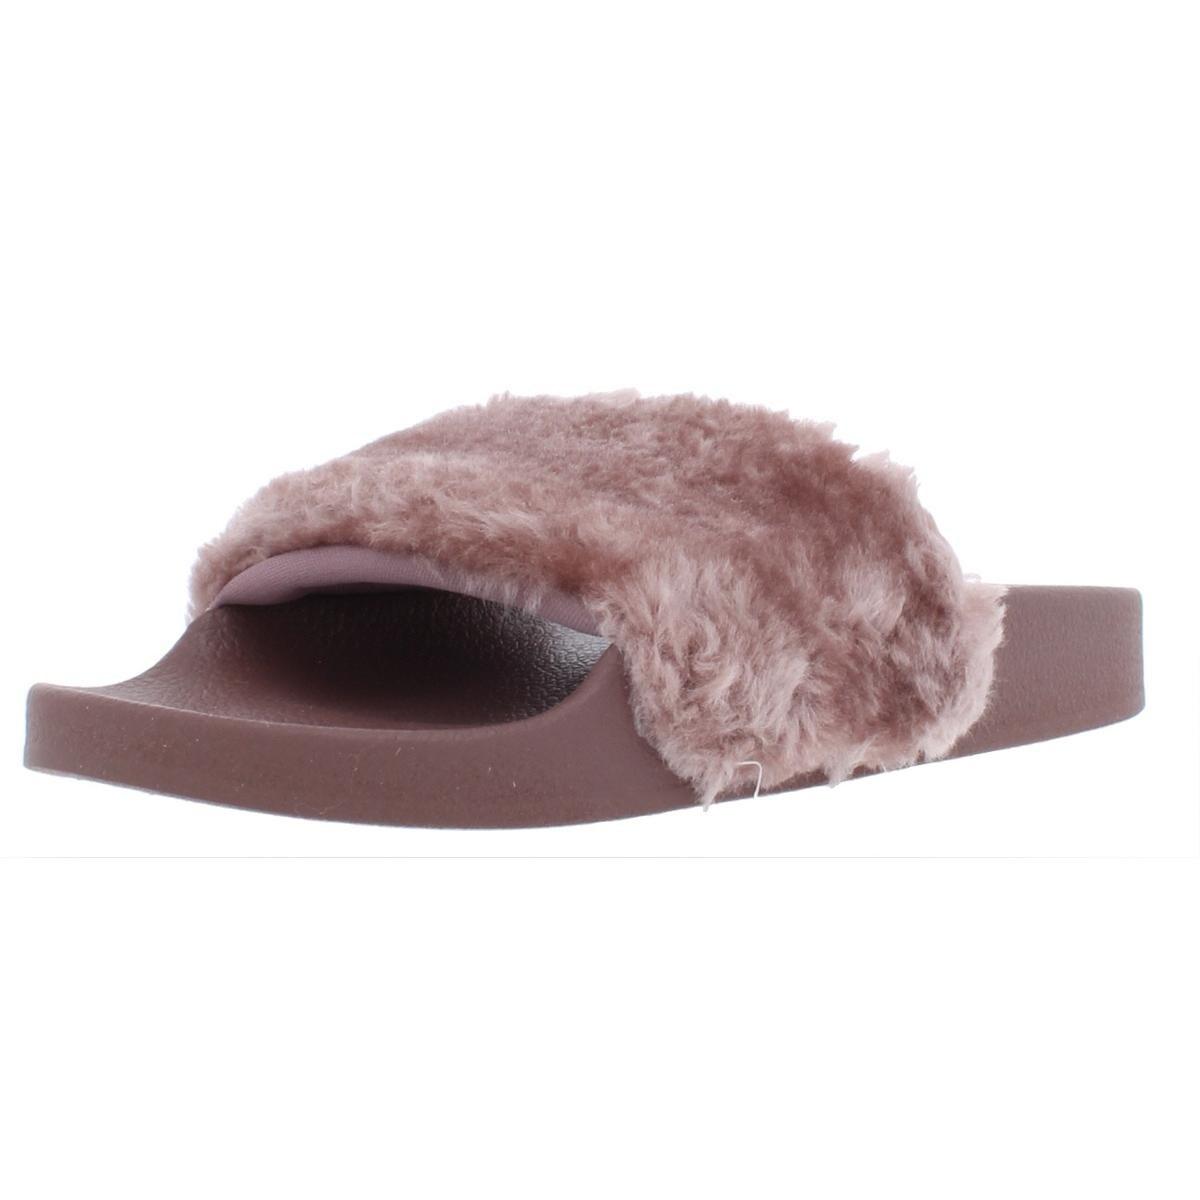 8f61b155045 Steve Madden Womens Softey Slide Sandals Faux Fur Pool